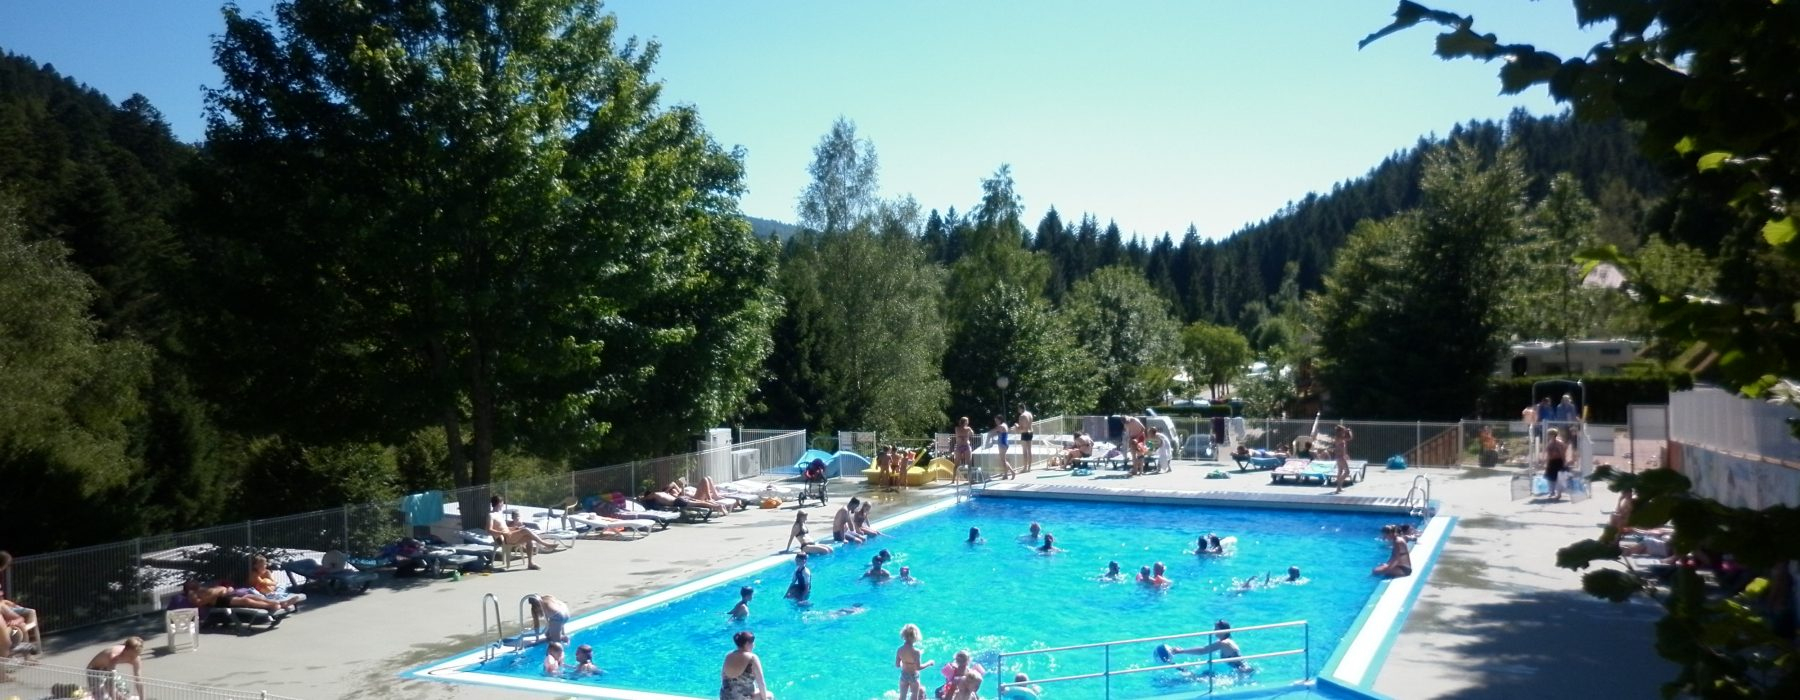 Swimming Pool Area   Camping Belle Hutte dedans Camping Gérardmer Avec Piscine